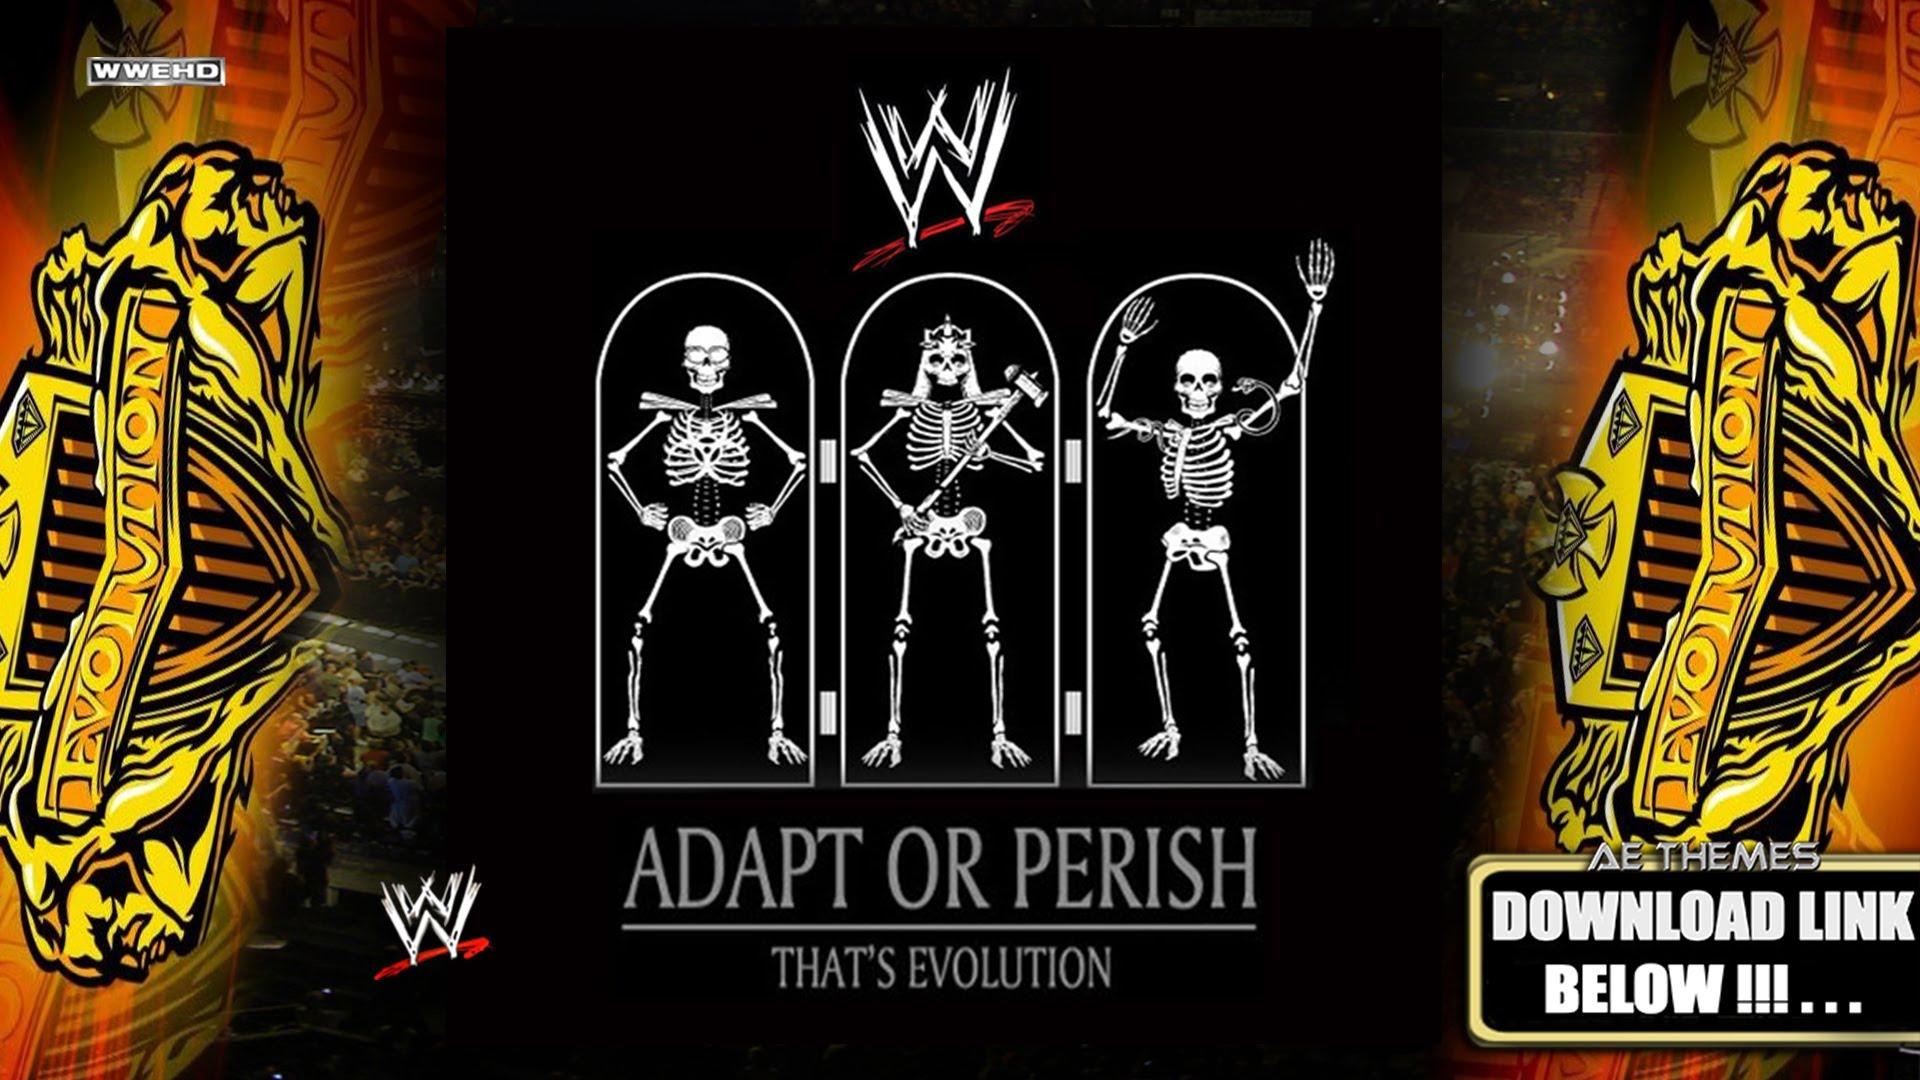 Download WWE Evolution [Adapt Or Perish] Arena Effect [Full Album 1920x1080